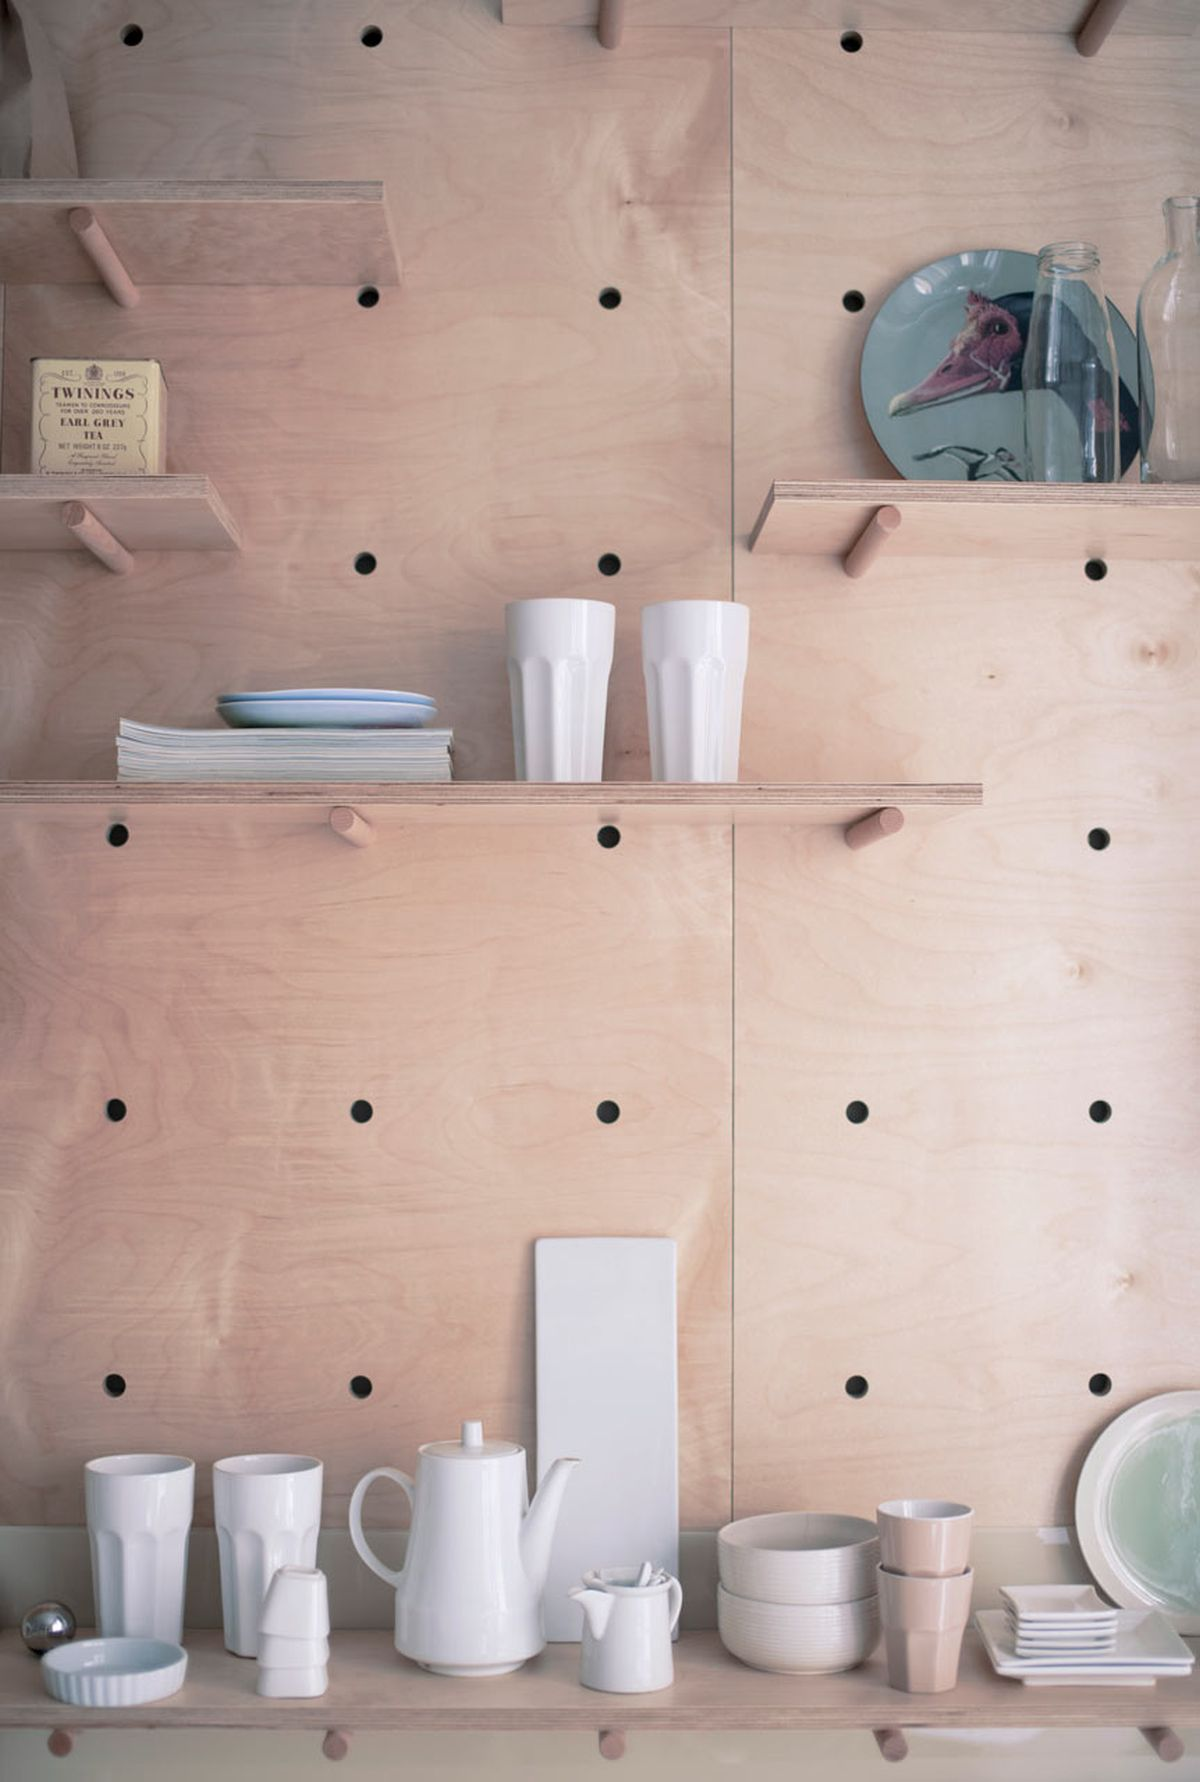 Small Budapest apartment for tourists kitchen shelves